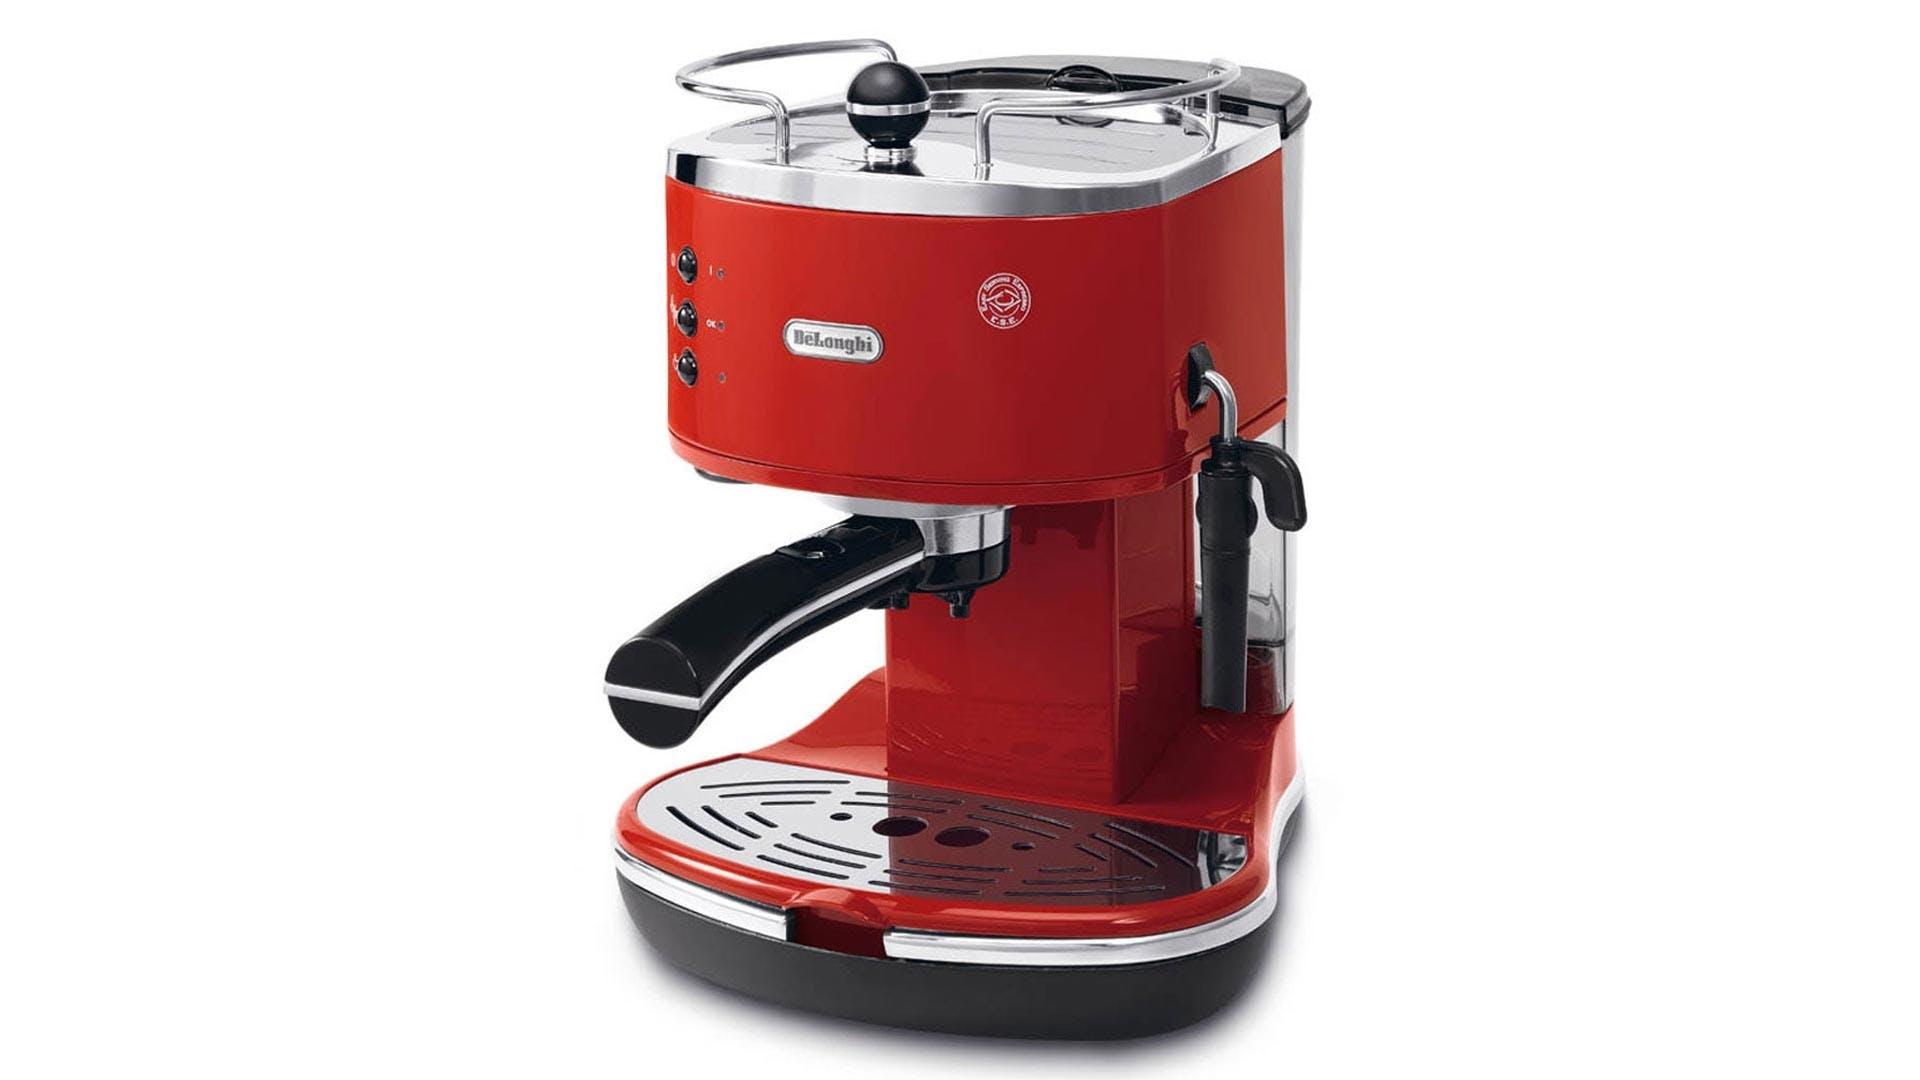 delonghi icona pump espresso machine red harvey norman. Black Bedroom Furniture Sets. Home Design Ideas